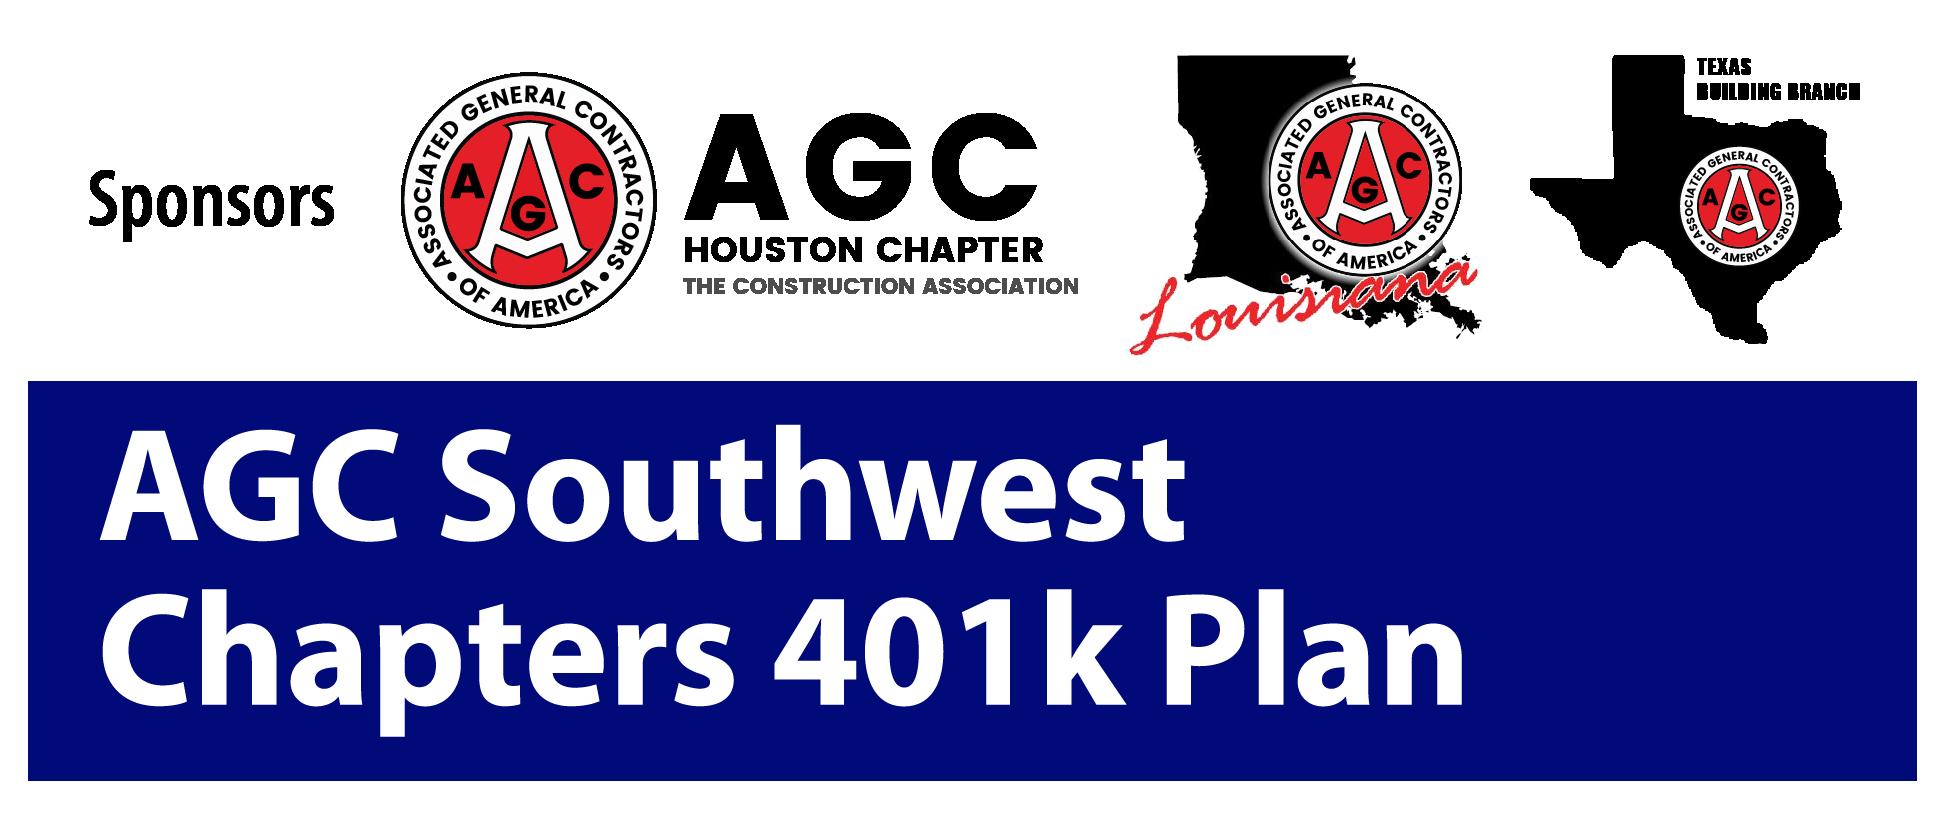 A G C Southwest Chapters 401 K Plan